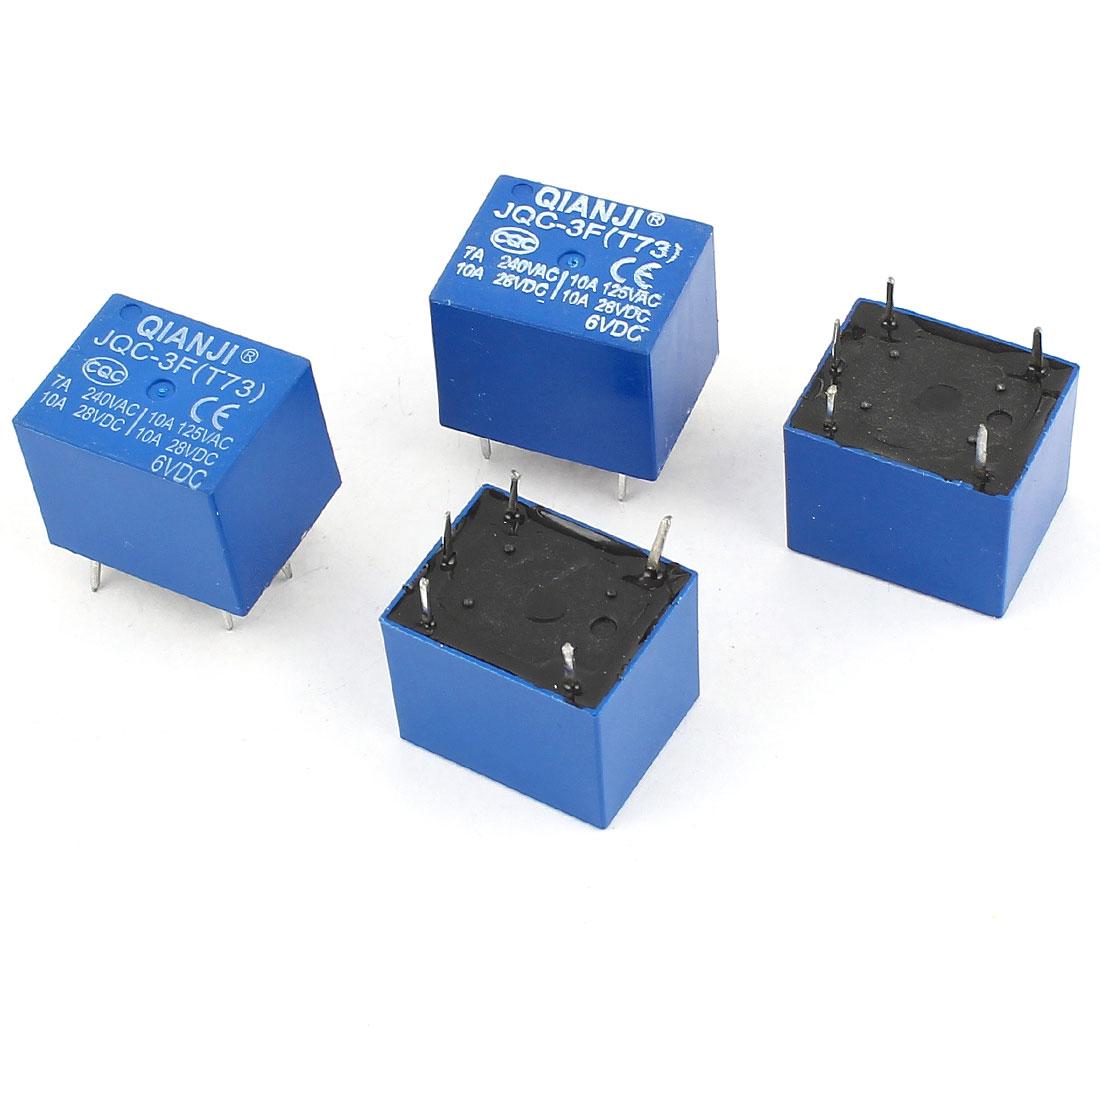 4 Pcs JQC-3F(T73) 5Pin SPST Power Relay DC 6V Coil 28V AC 125V 240V Load